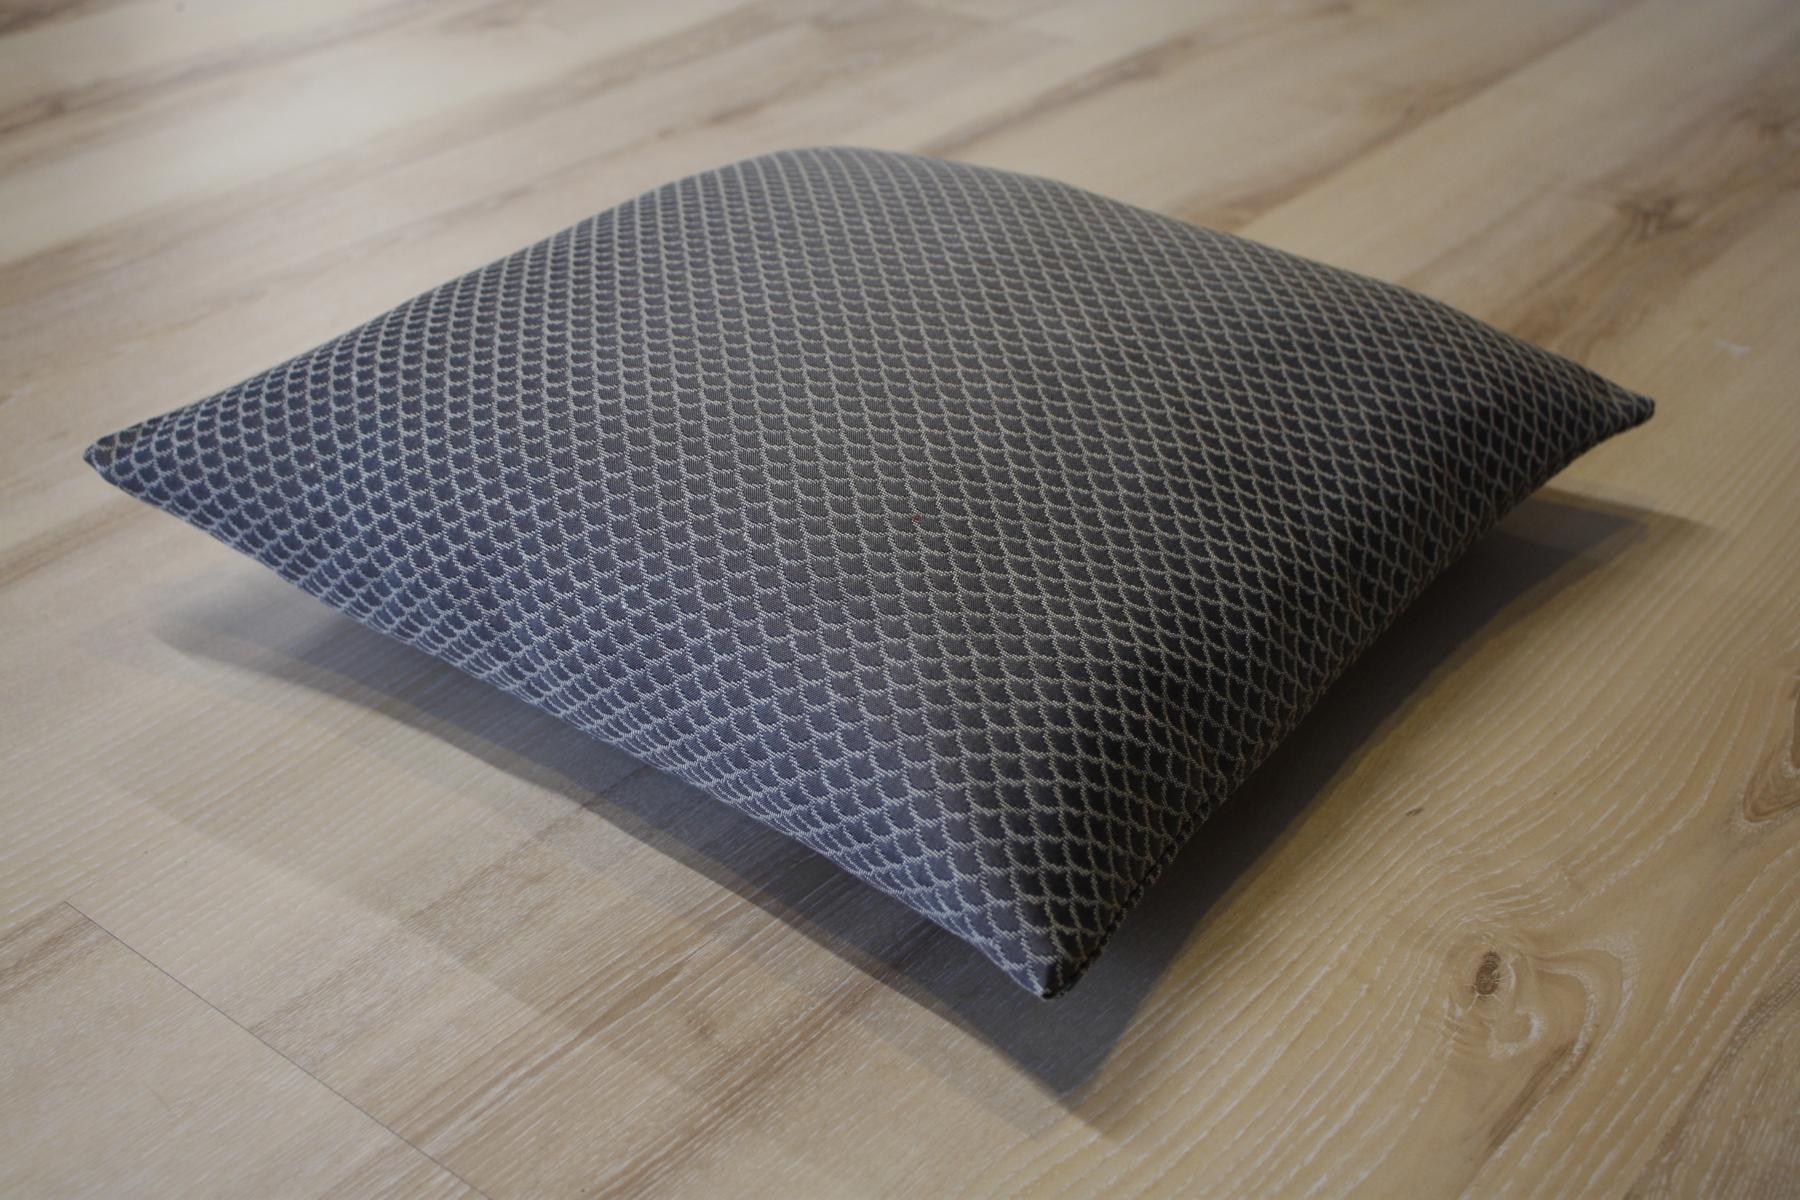 joop teppich grau home image ideen. Black Bedroom Furniture Sets. Home Design Ideas